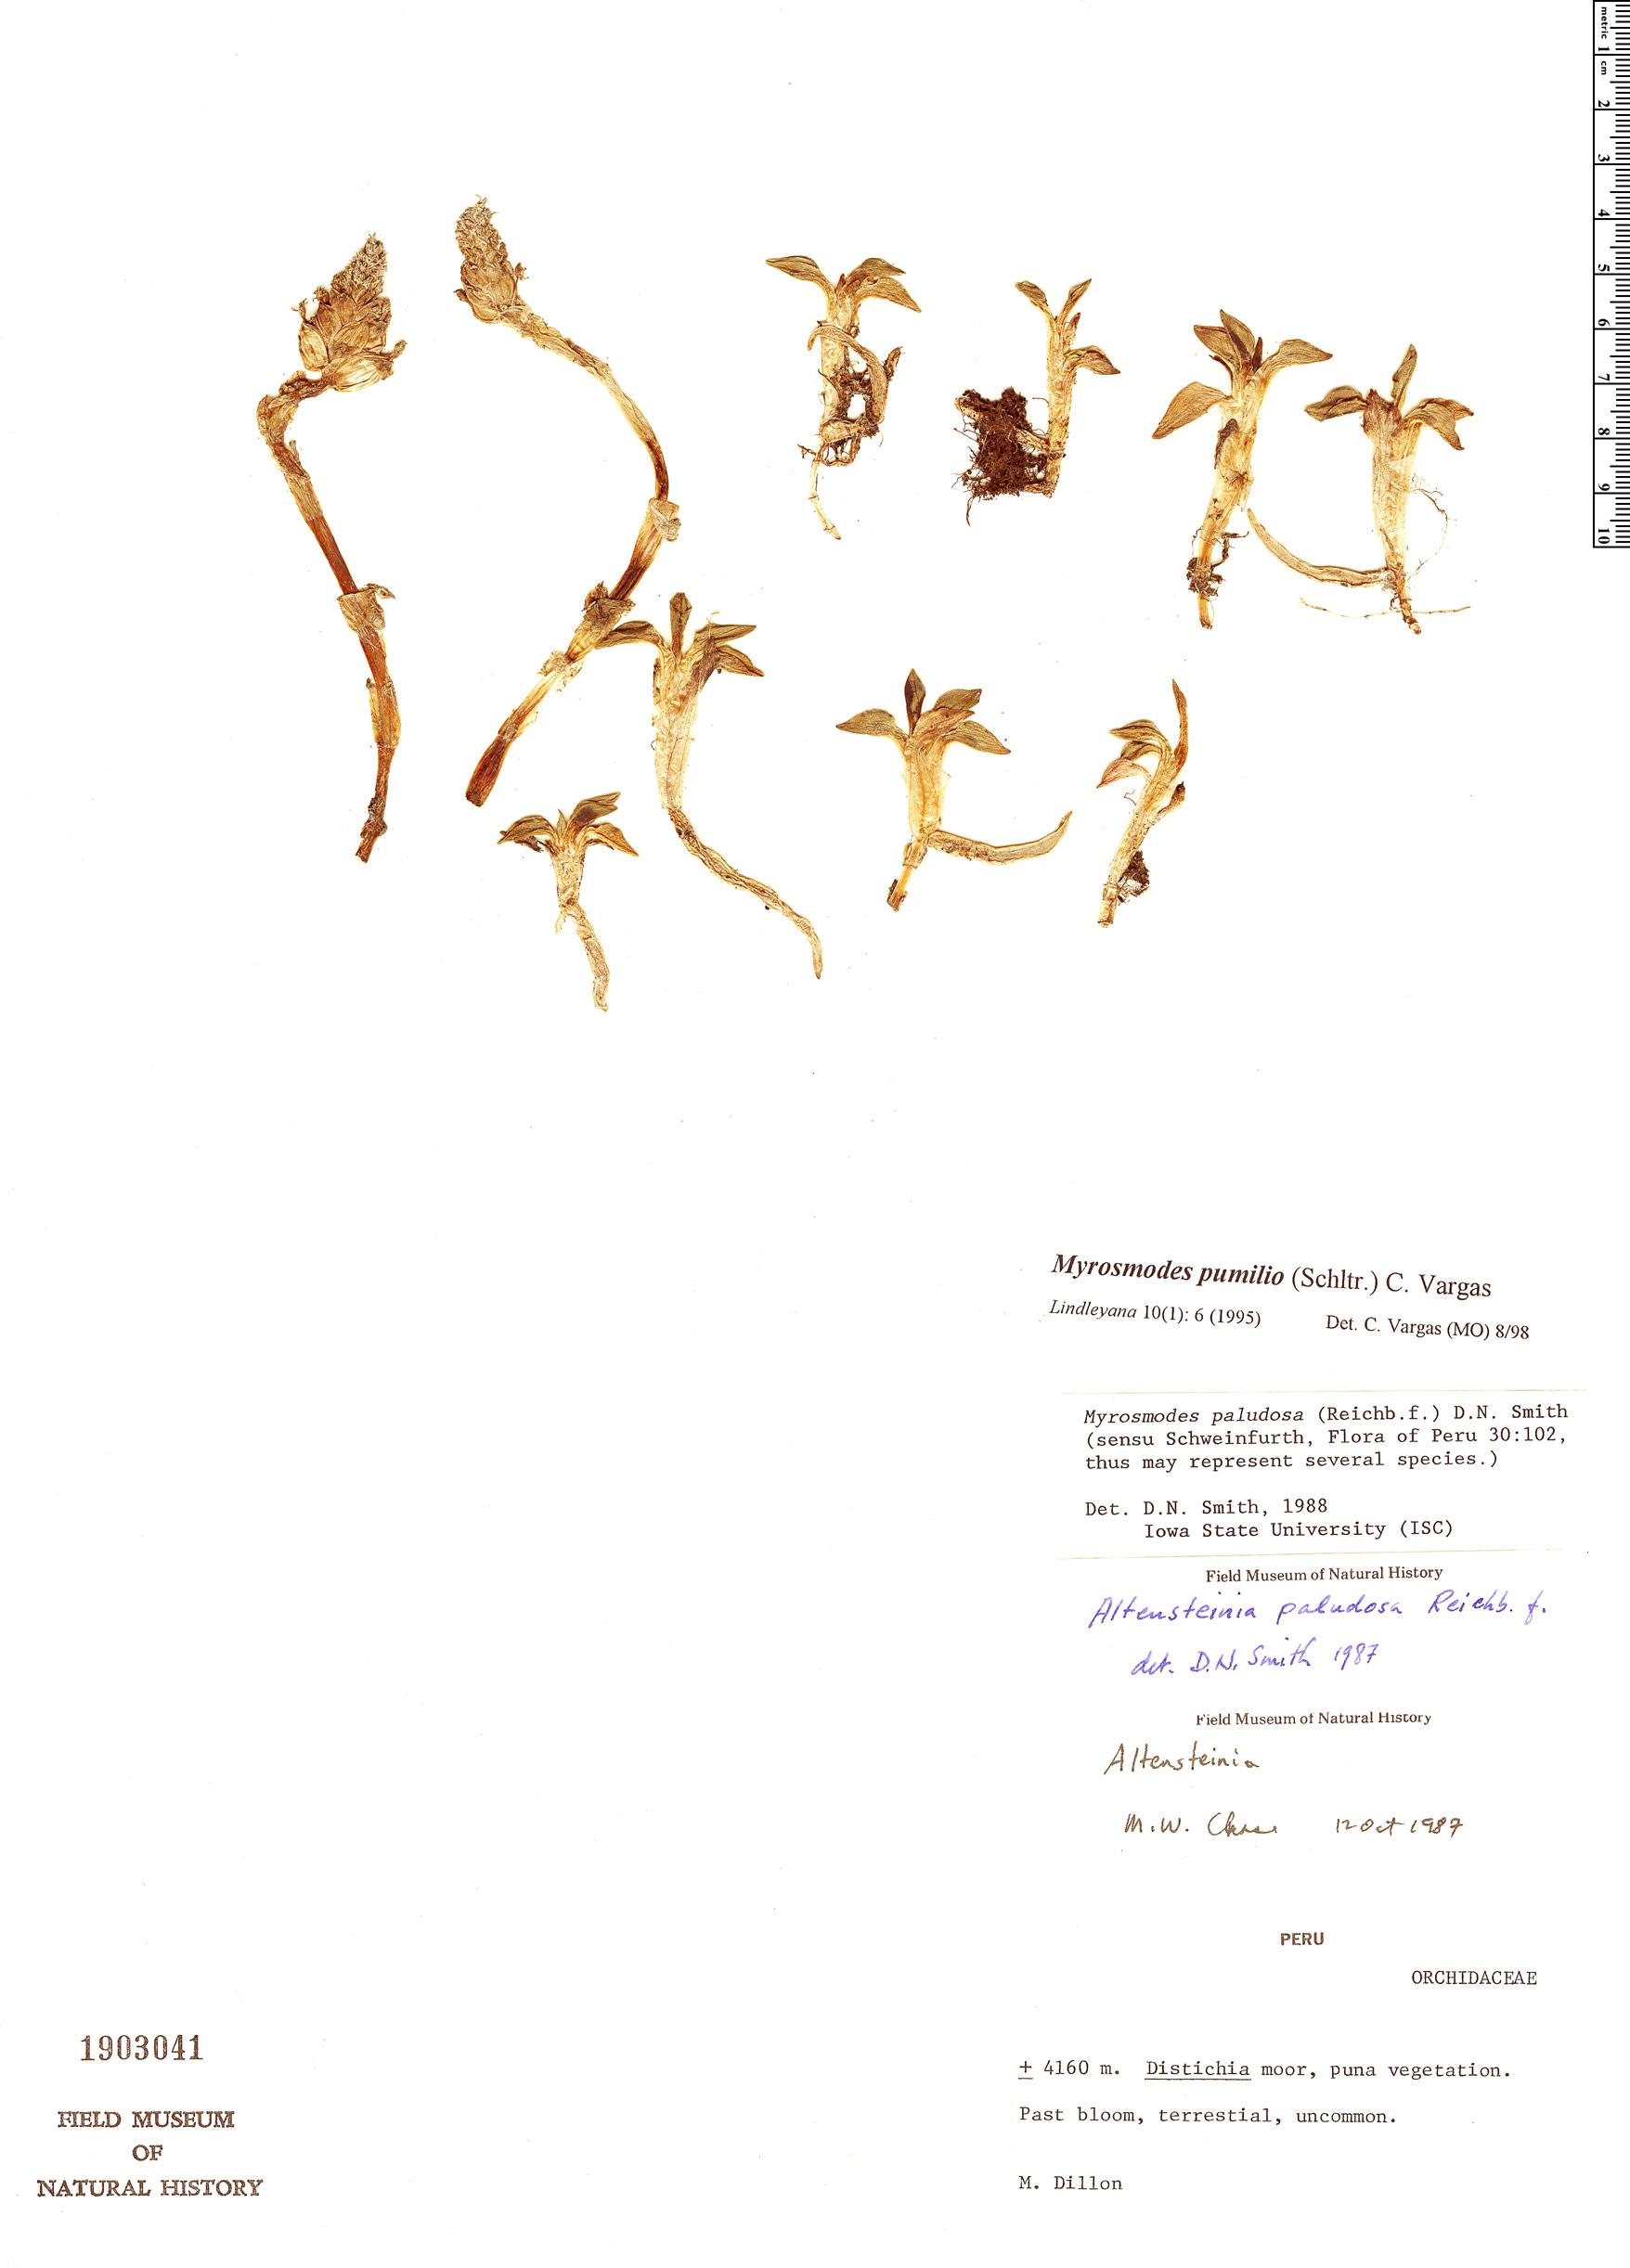 Specimen: Myrosmodes pumilio